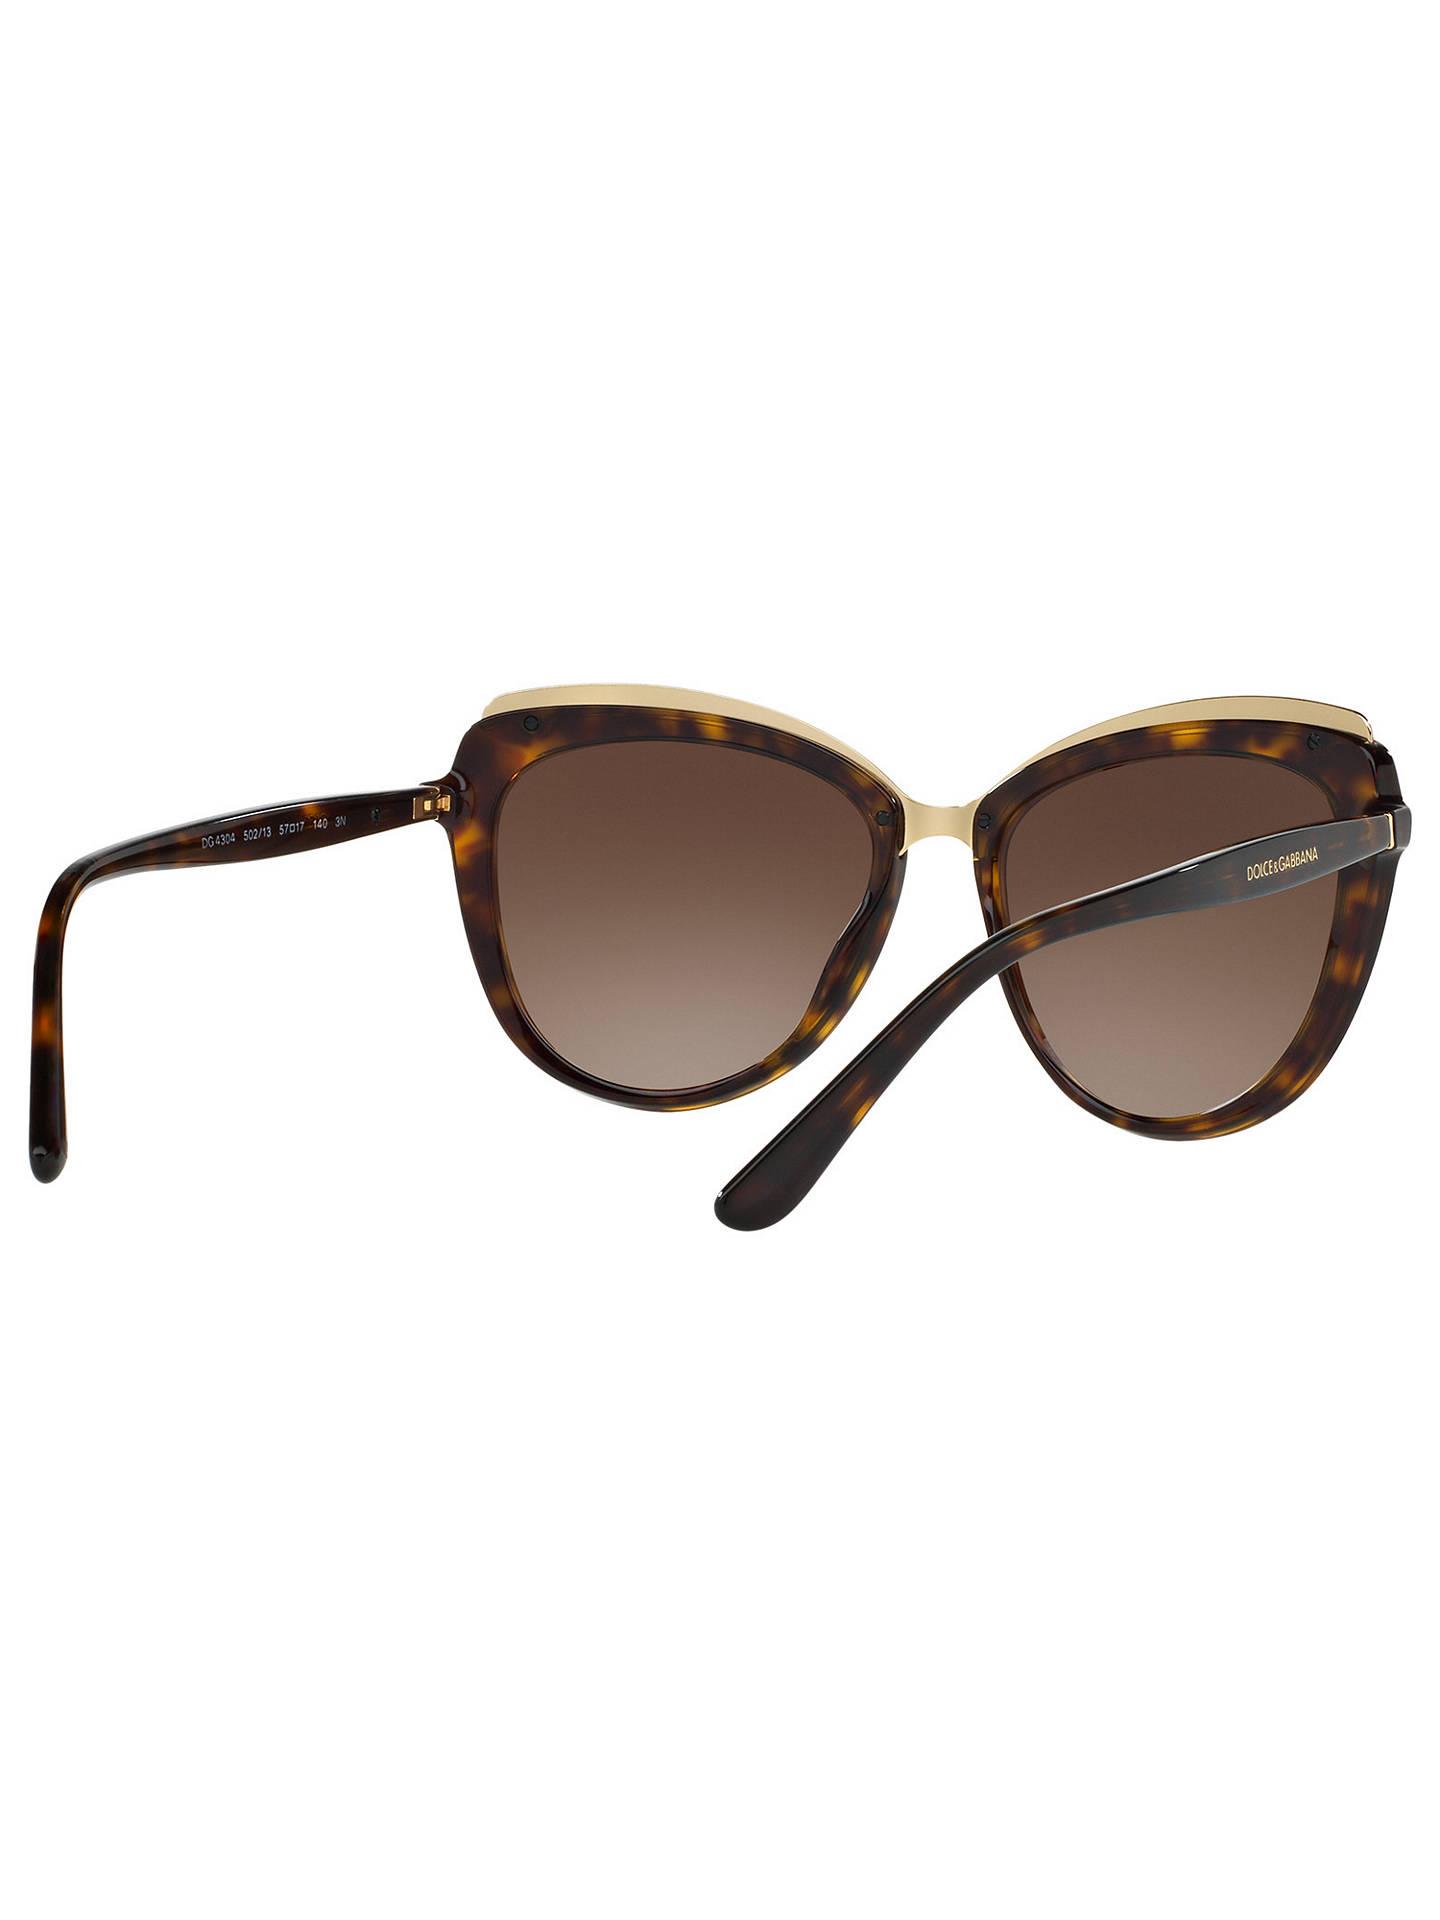 b052c309c060 Dolce   Gabbana DG4304 Cat s Eye Sunglasses at John Lewis   Partners